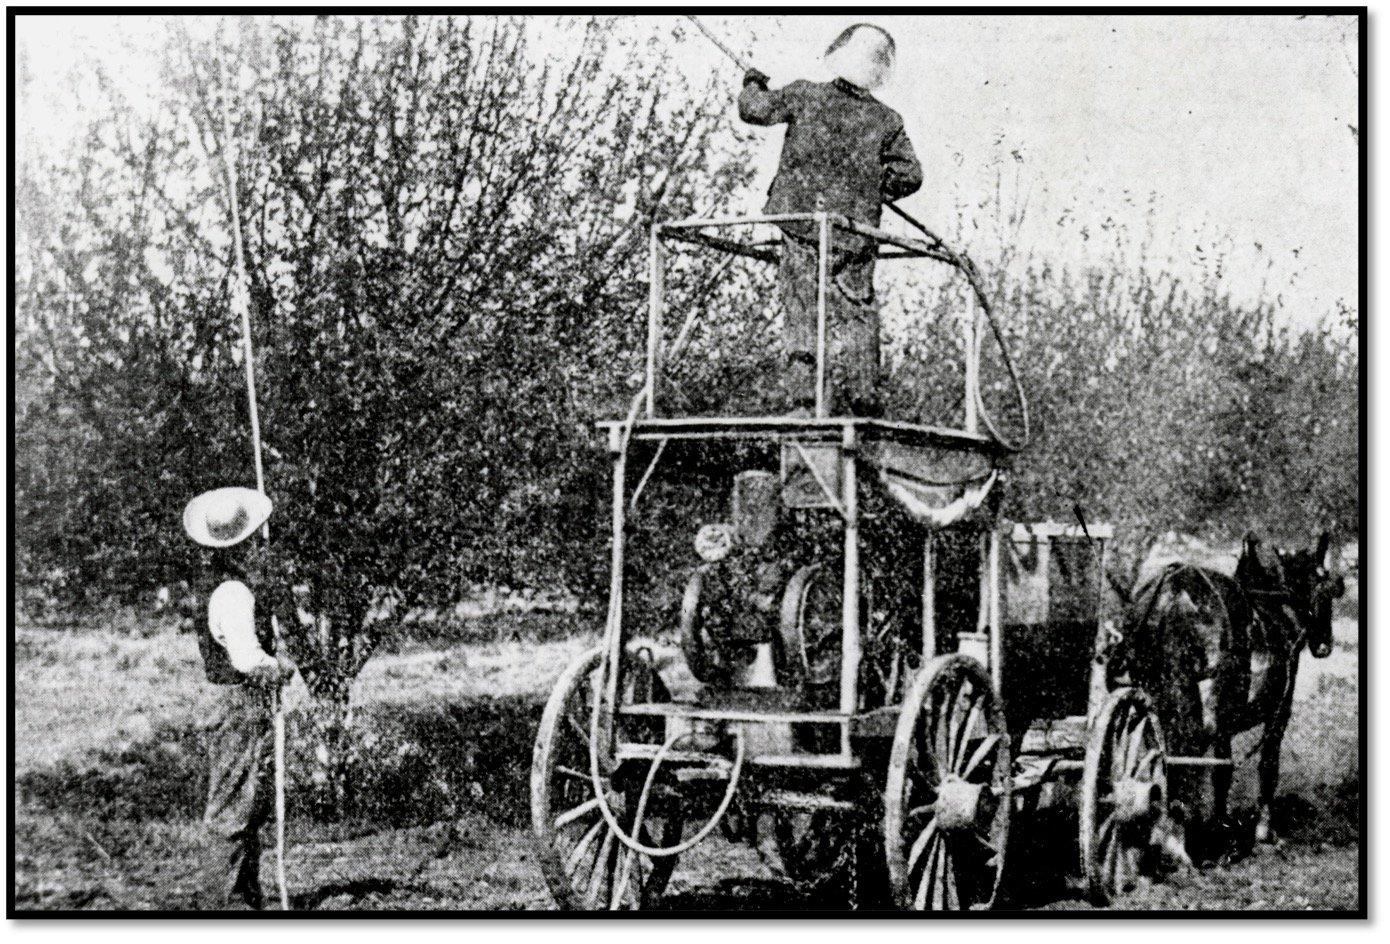 Spraying the Bordeaux chemical mixture on the Cultivars BHA 1980.1.35